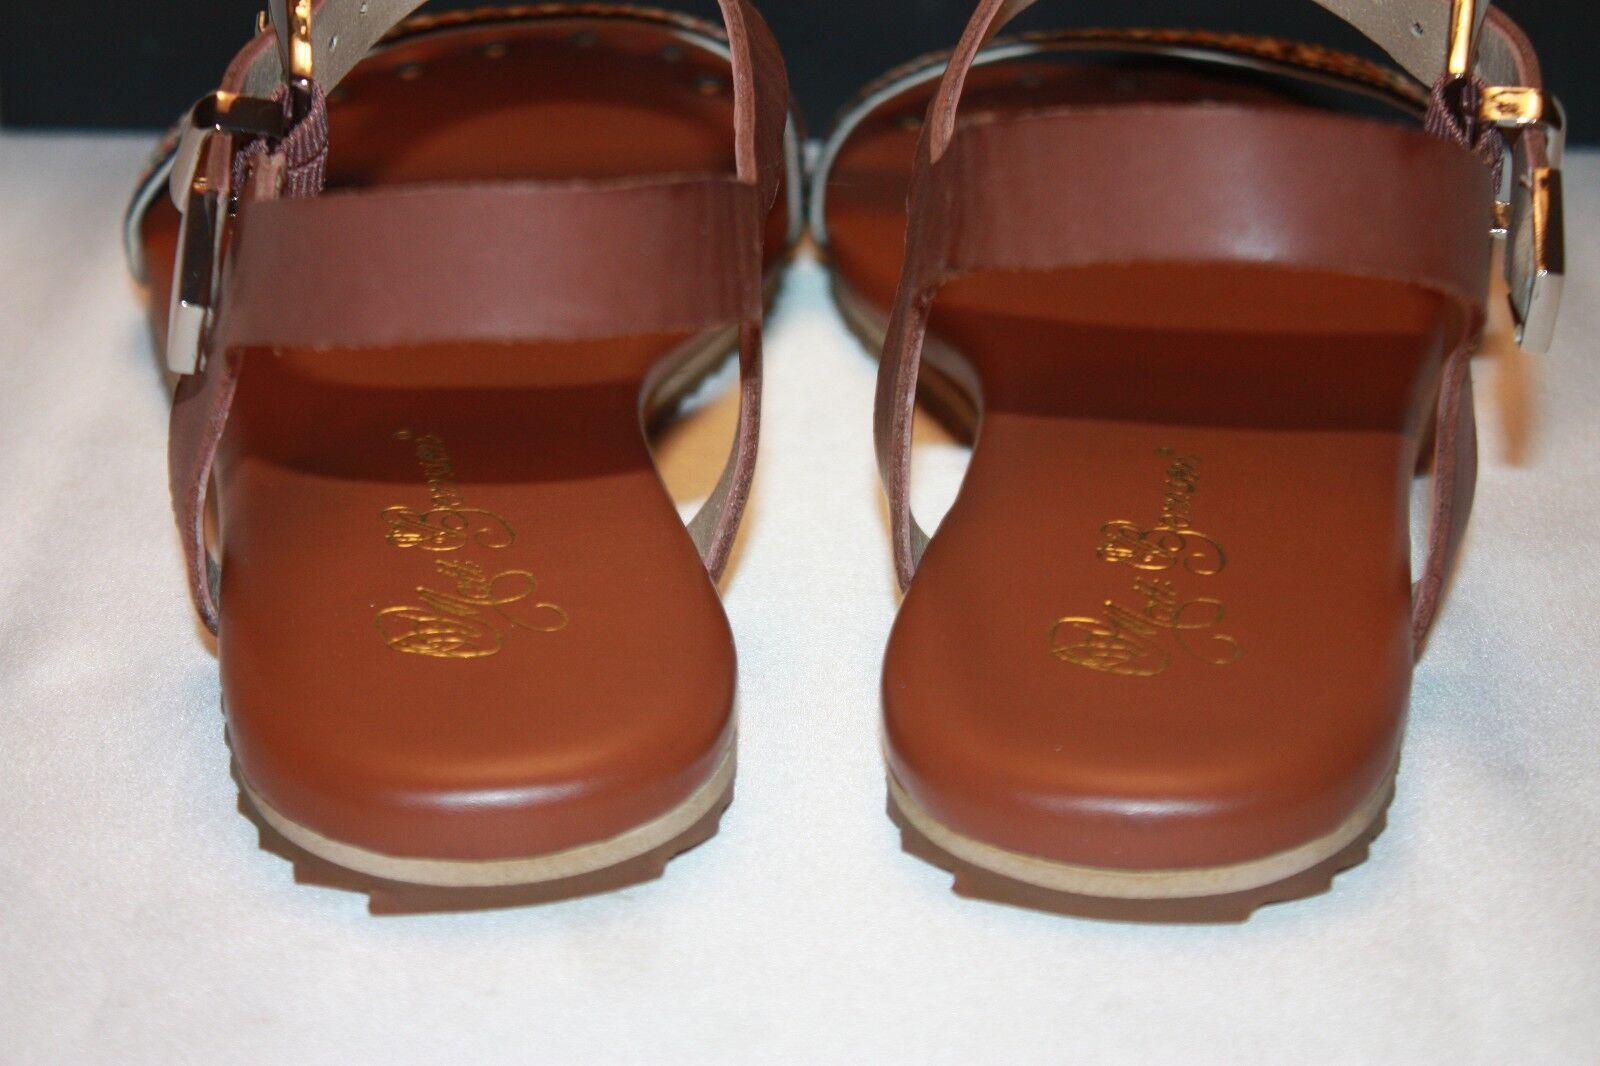 NEW  NIB  MATT BERNSON New York Cognac DJANGO Cognac York Leder Flat Sandale 9 10 156 60d72e